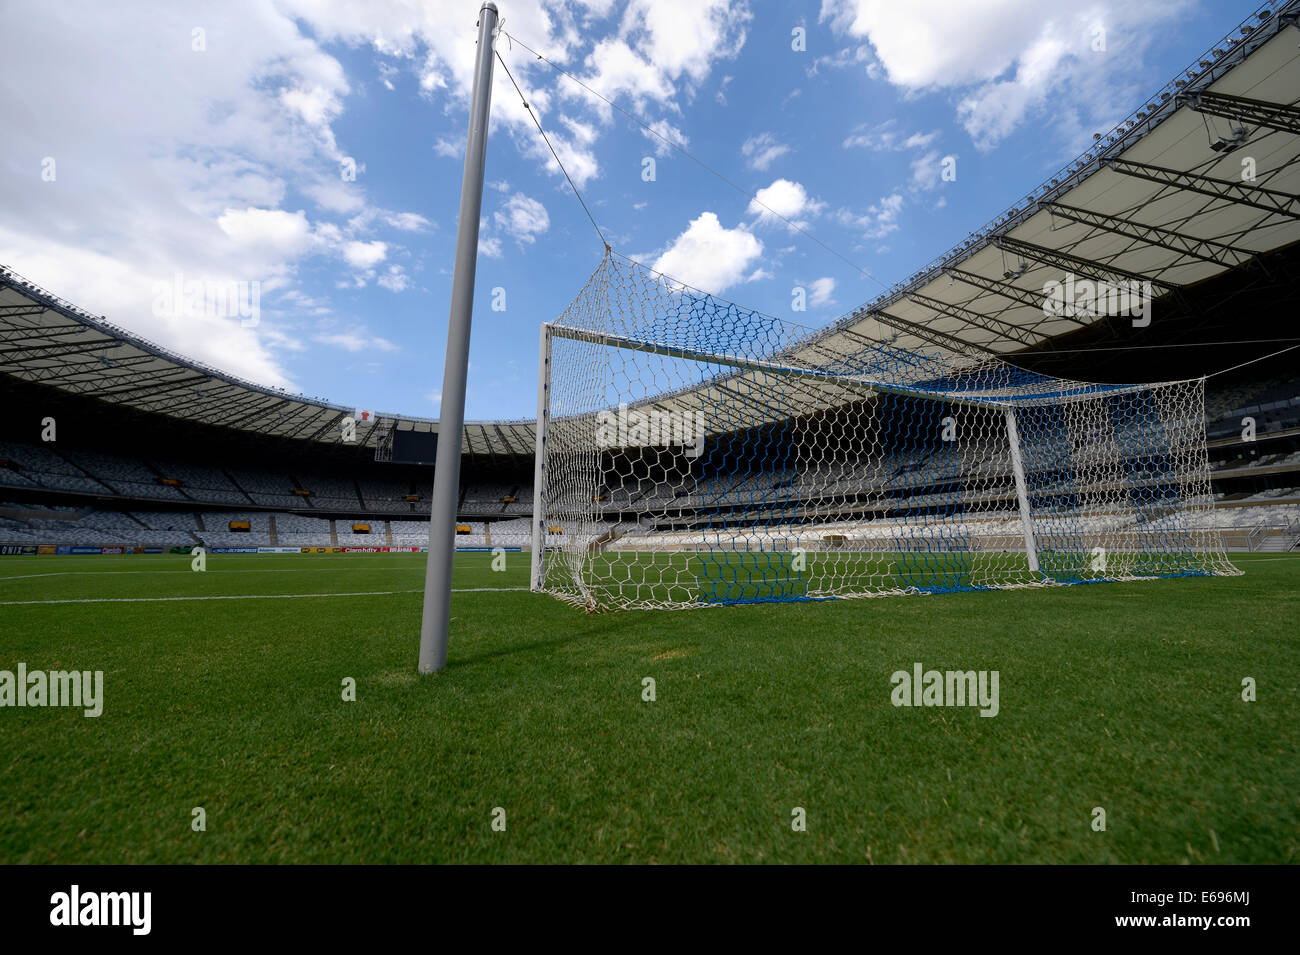 Venue for the FIFA World Cup 2014, Estadio Governador Magalhaes Pinto or Mineirao, Belo Horizonte, Minas Gerais, - Stock Image